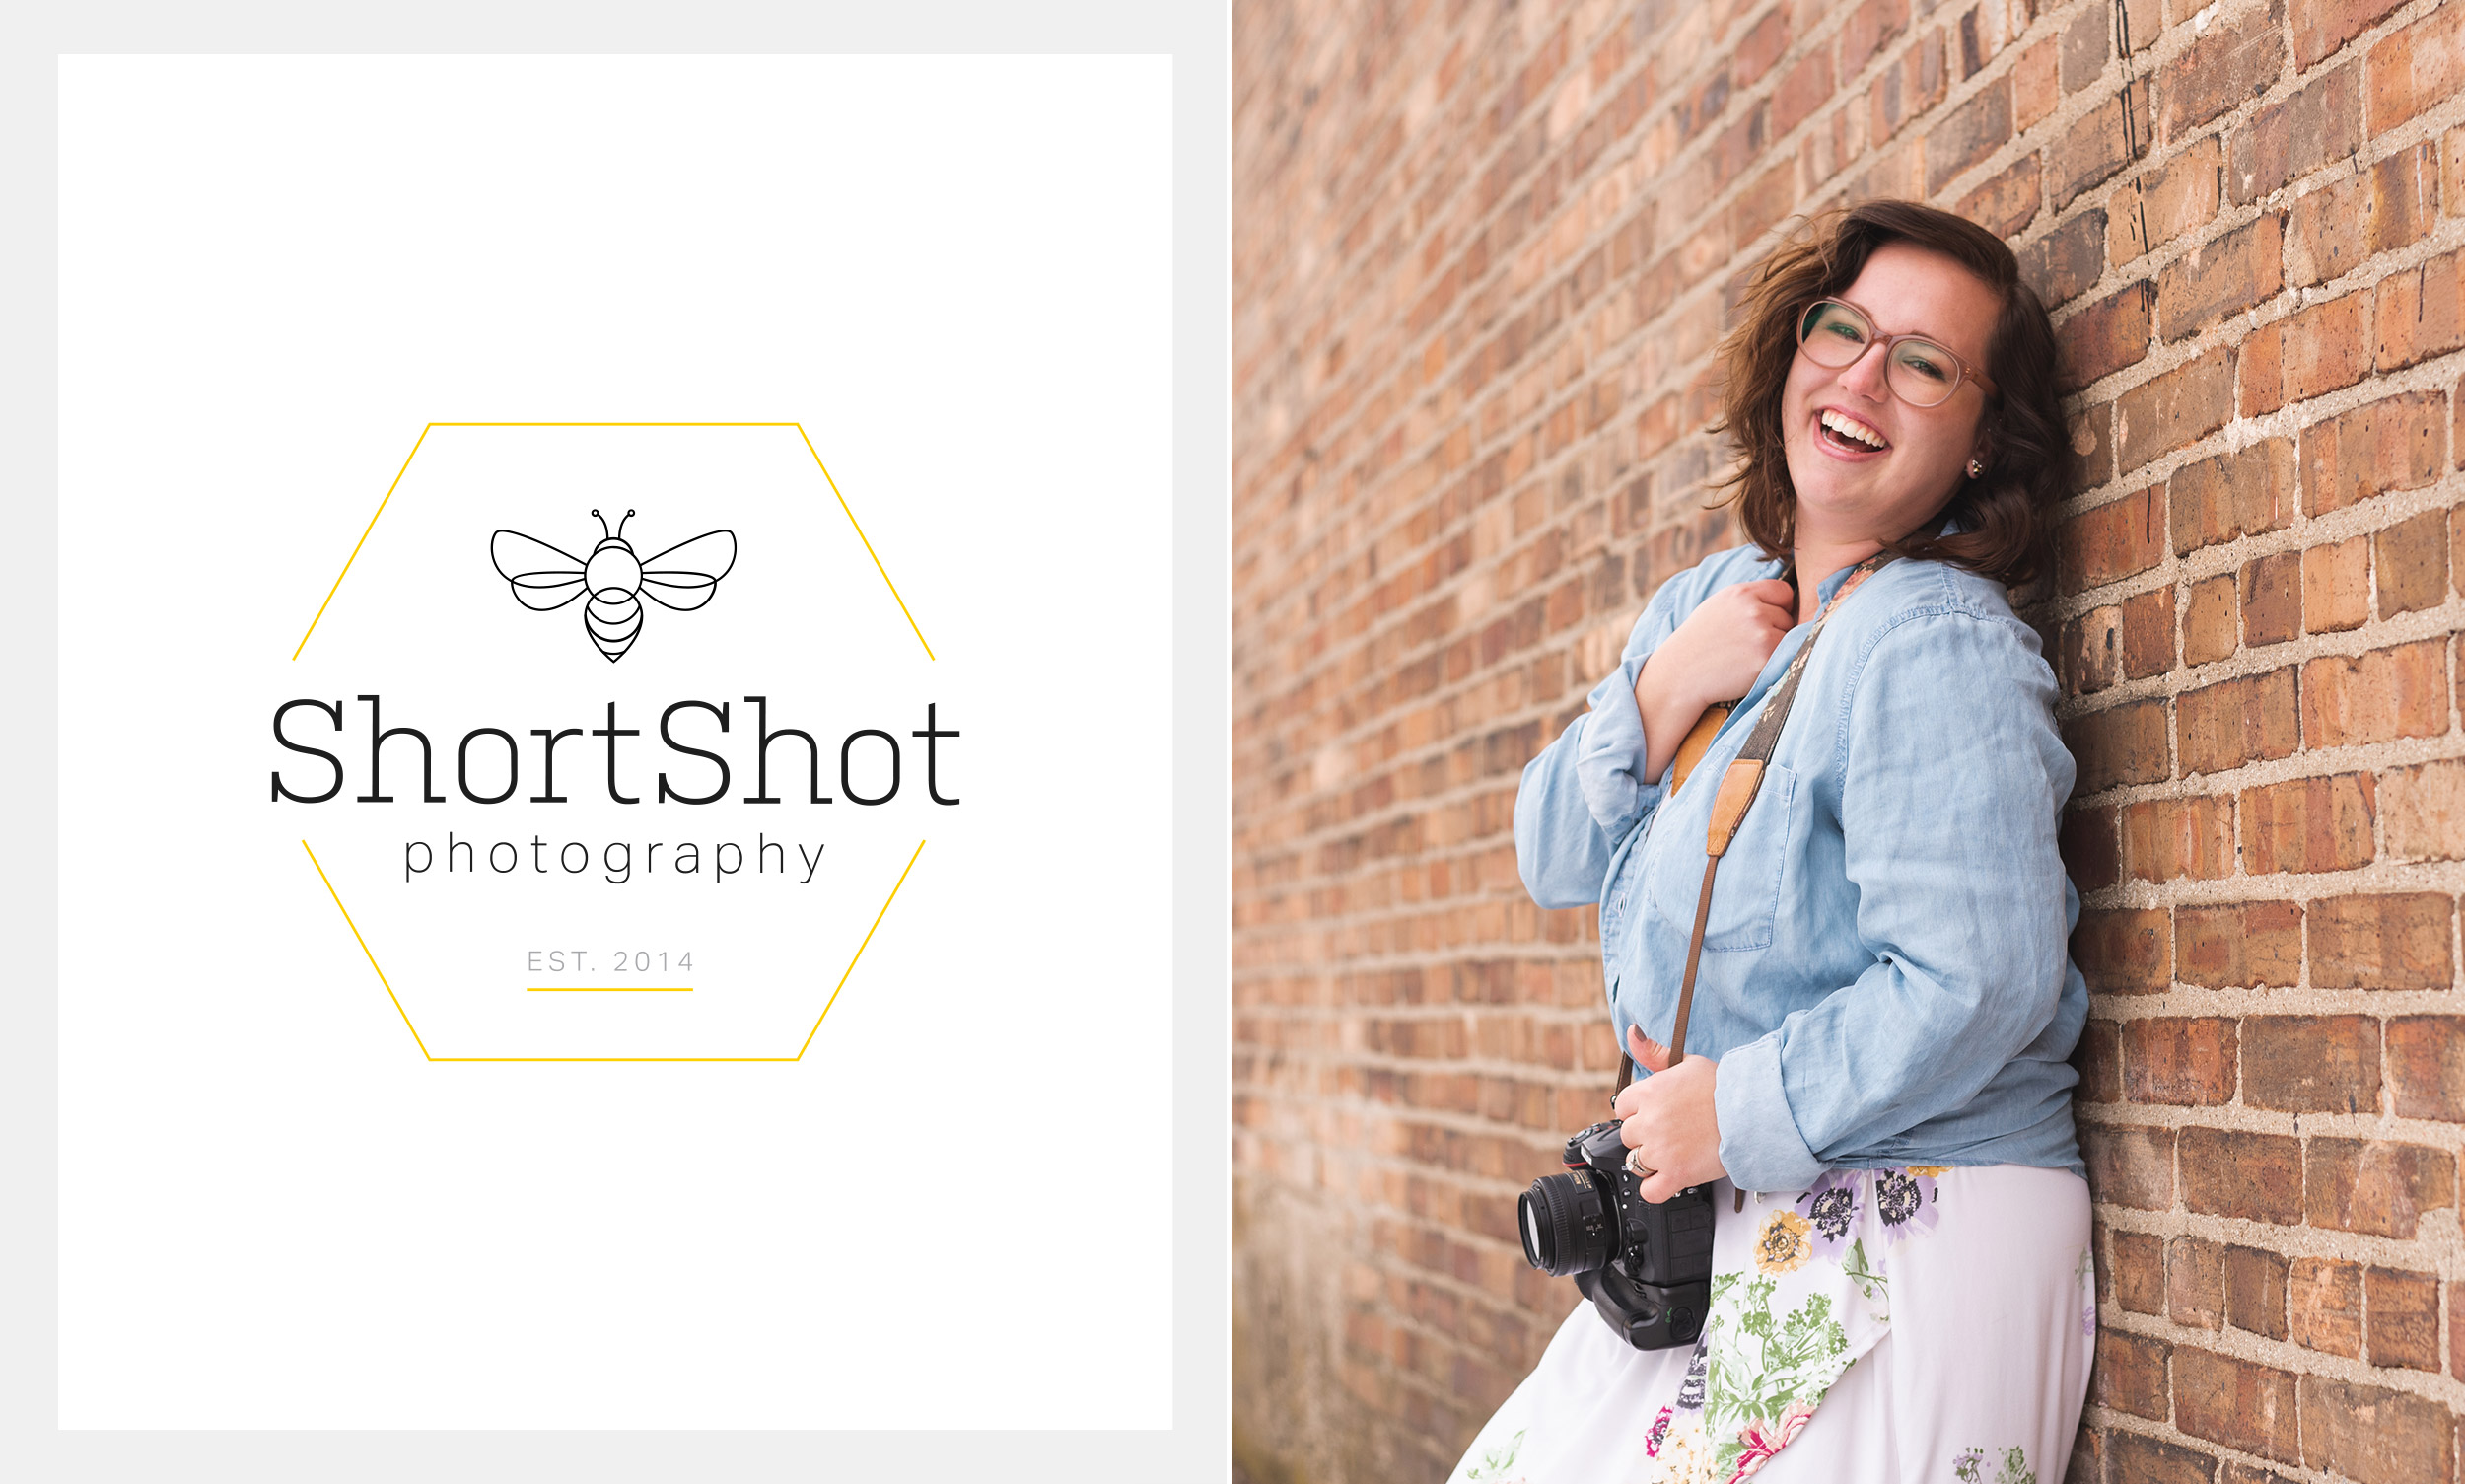 short-shot-photography-branding-01.jpg